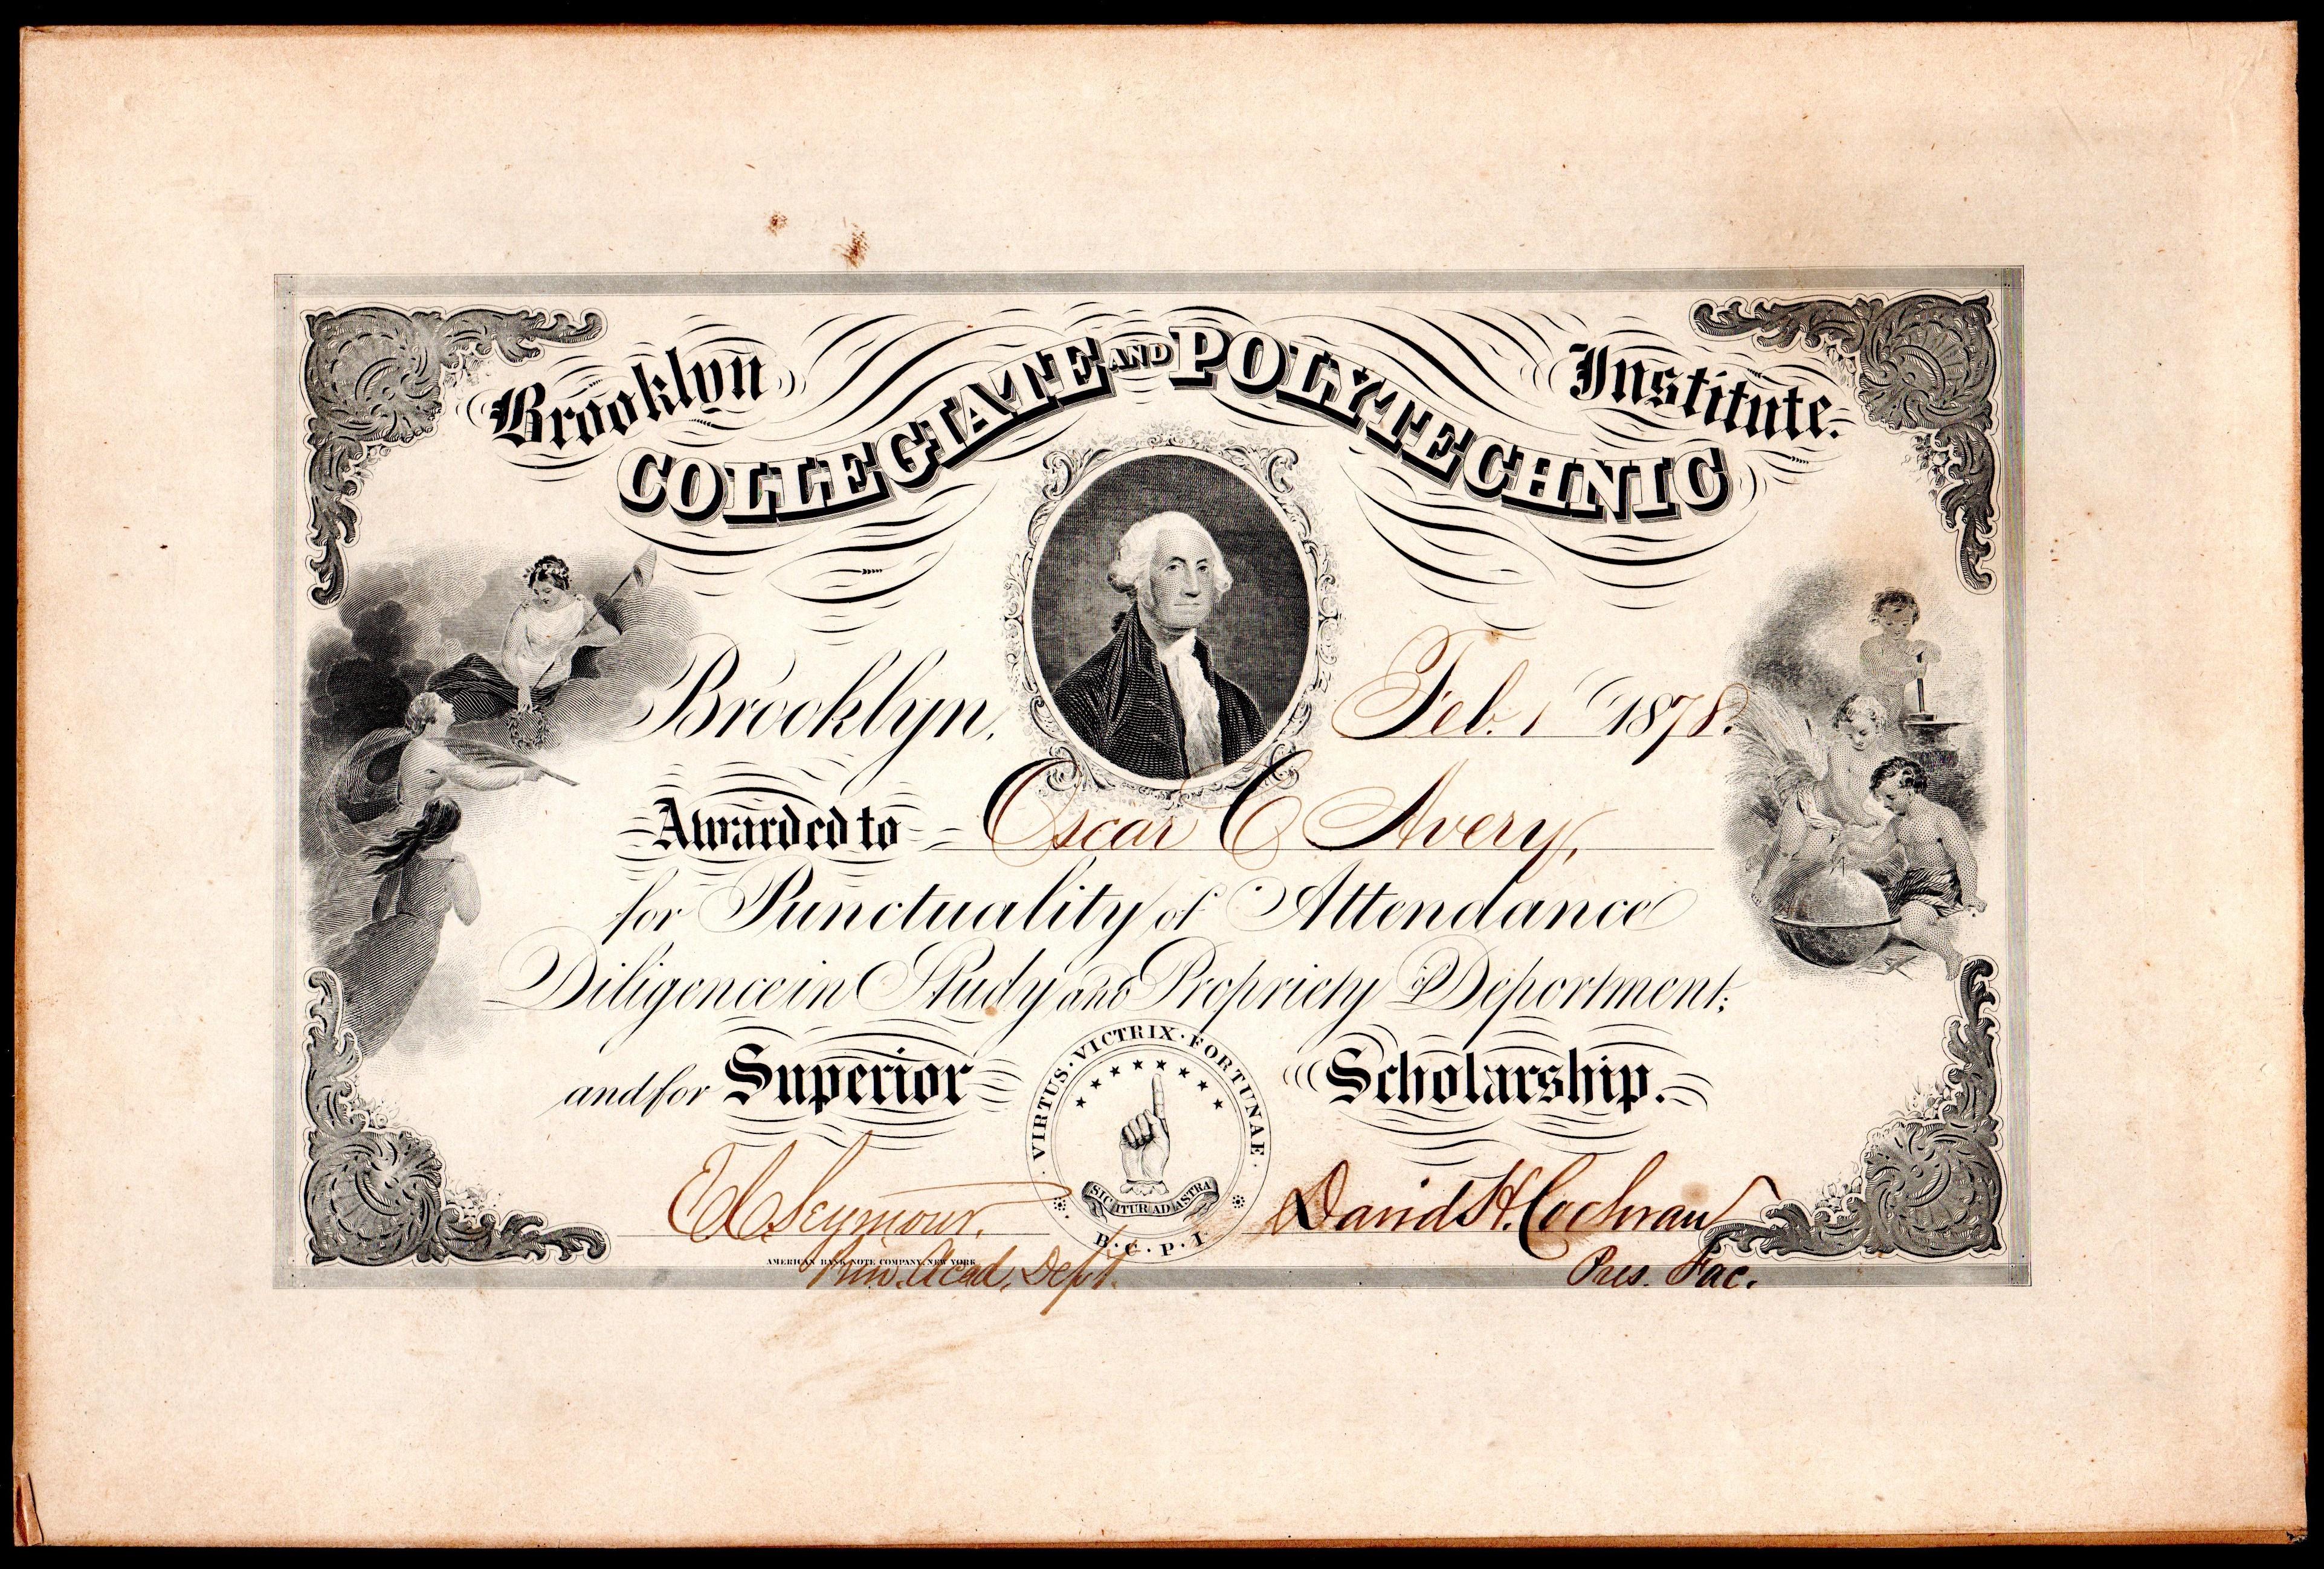 1878 Brooklyn Polytech Certificate.jpg